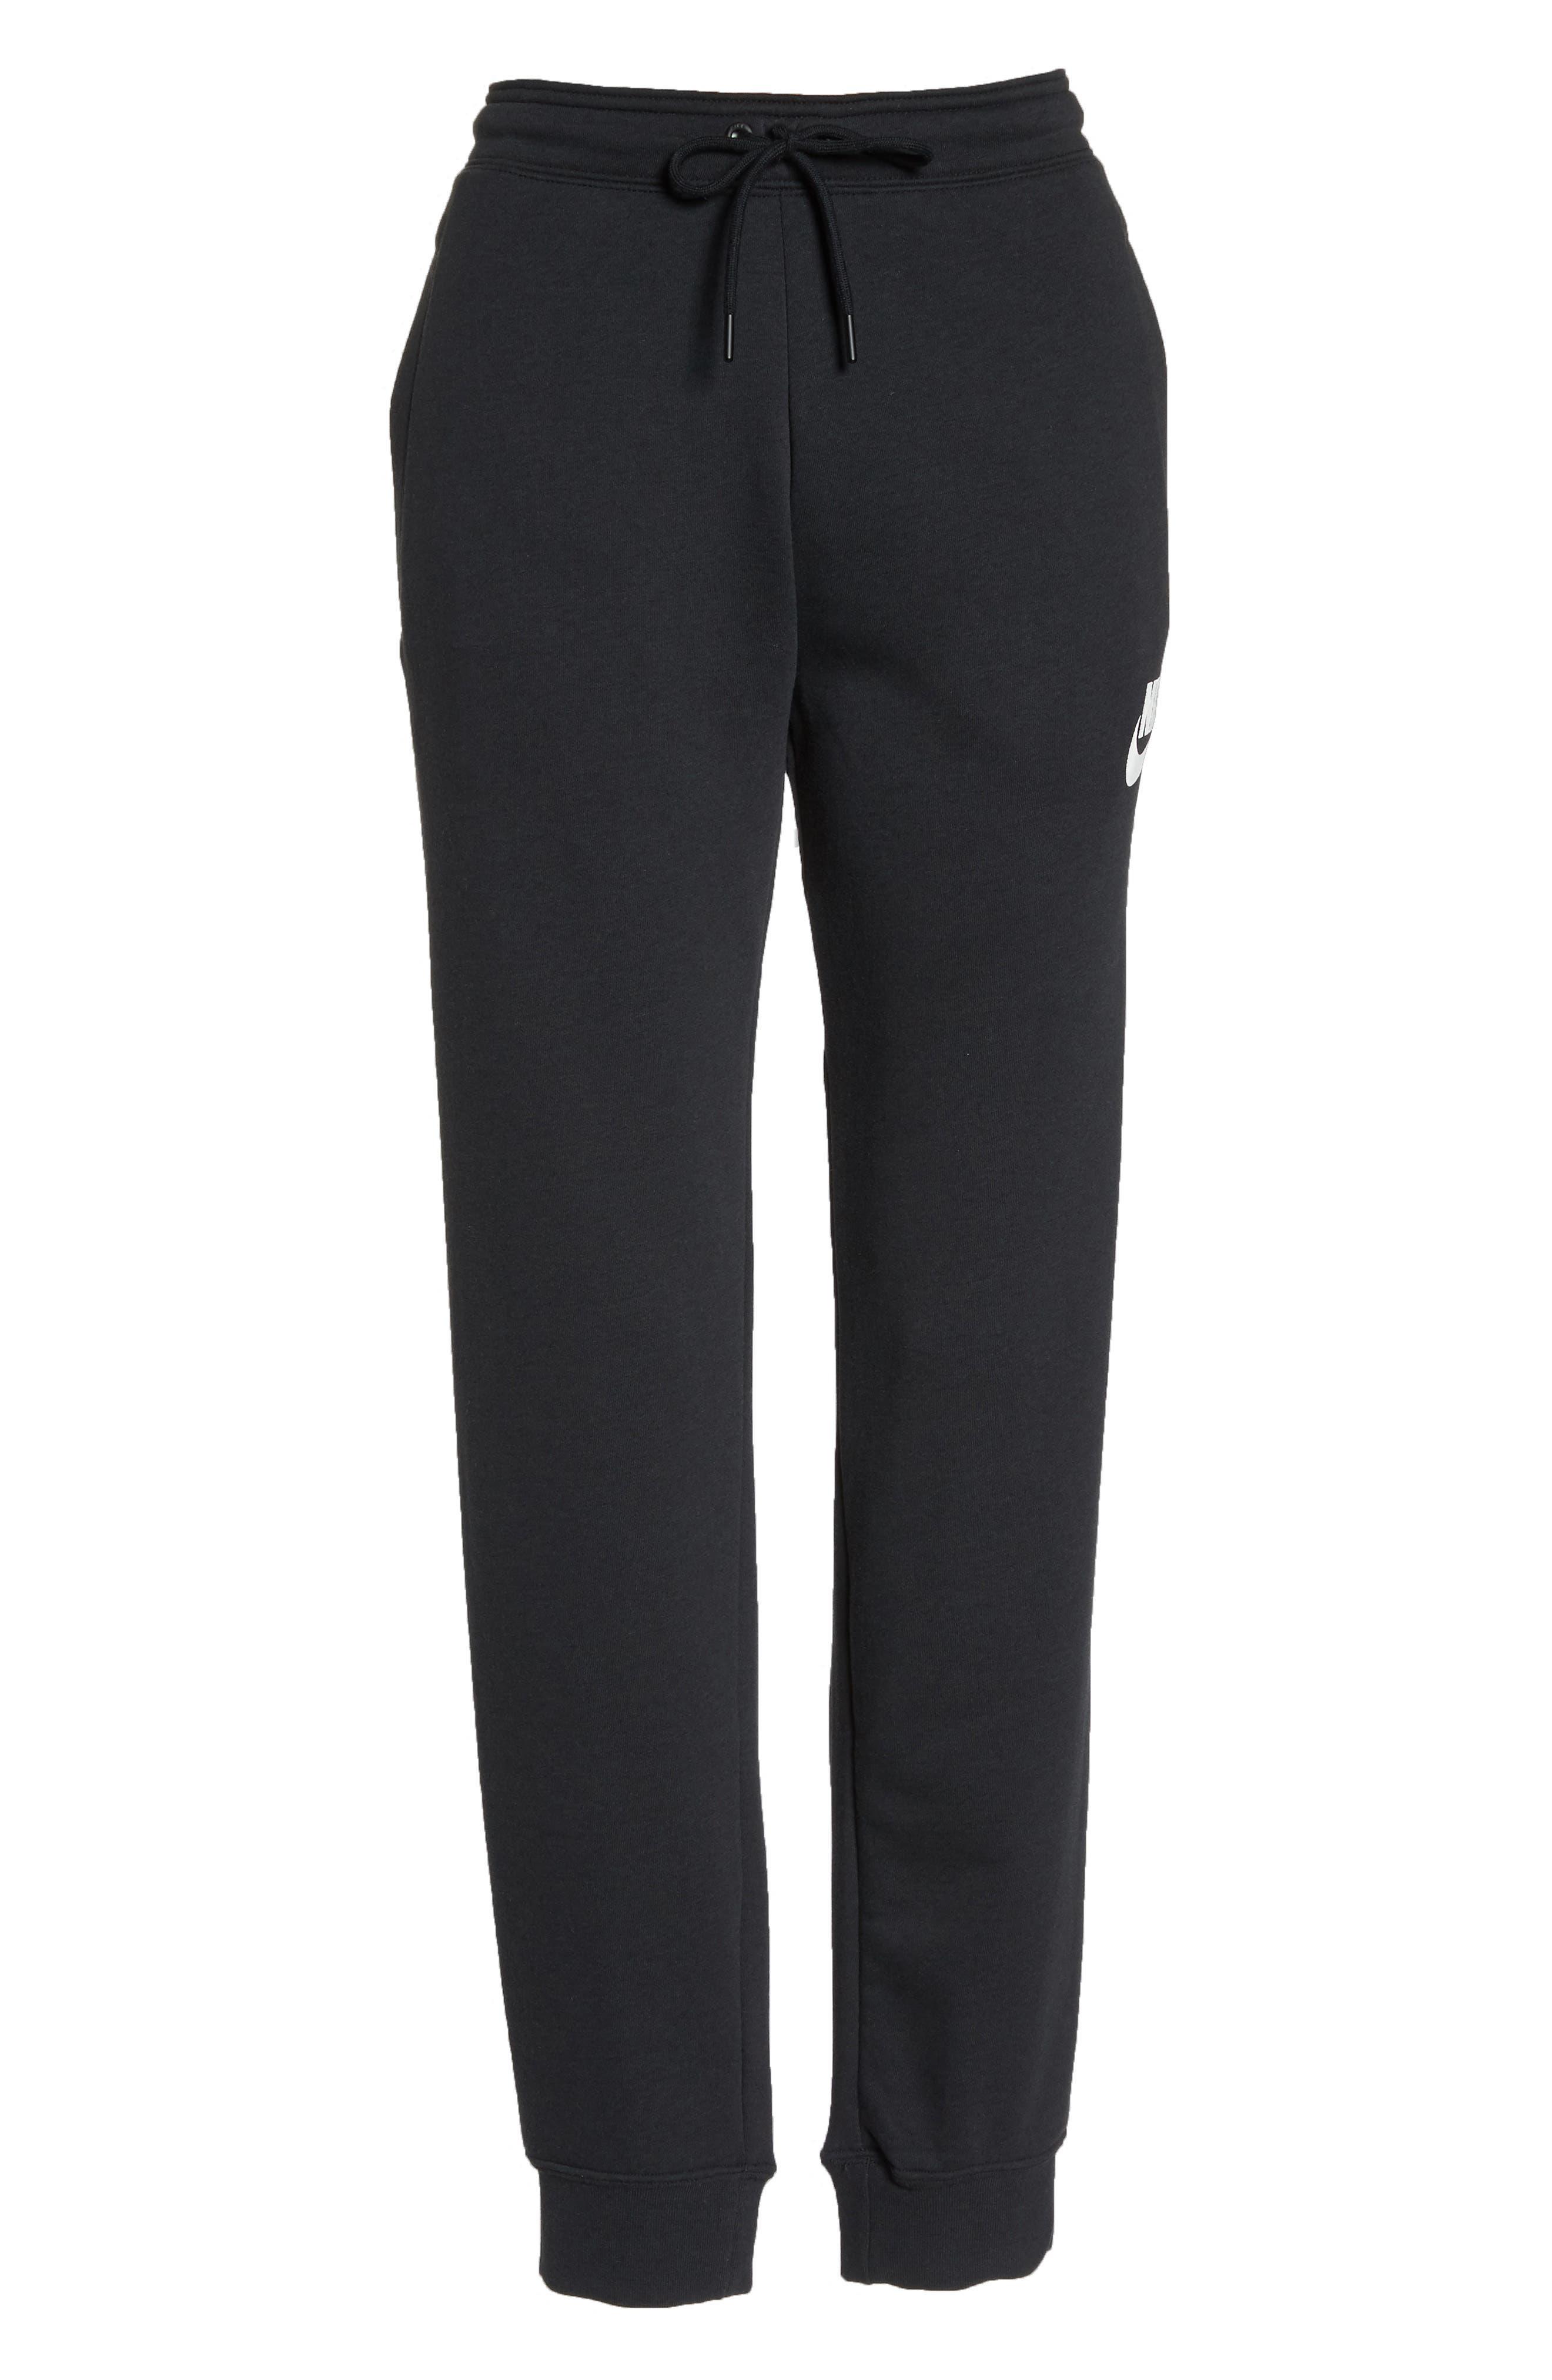 Sportswear Rally Jogger Pants,                             Alternate thumbnail 7, color,                             BLACK/ BLACK/ WHITE